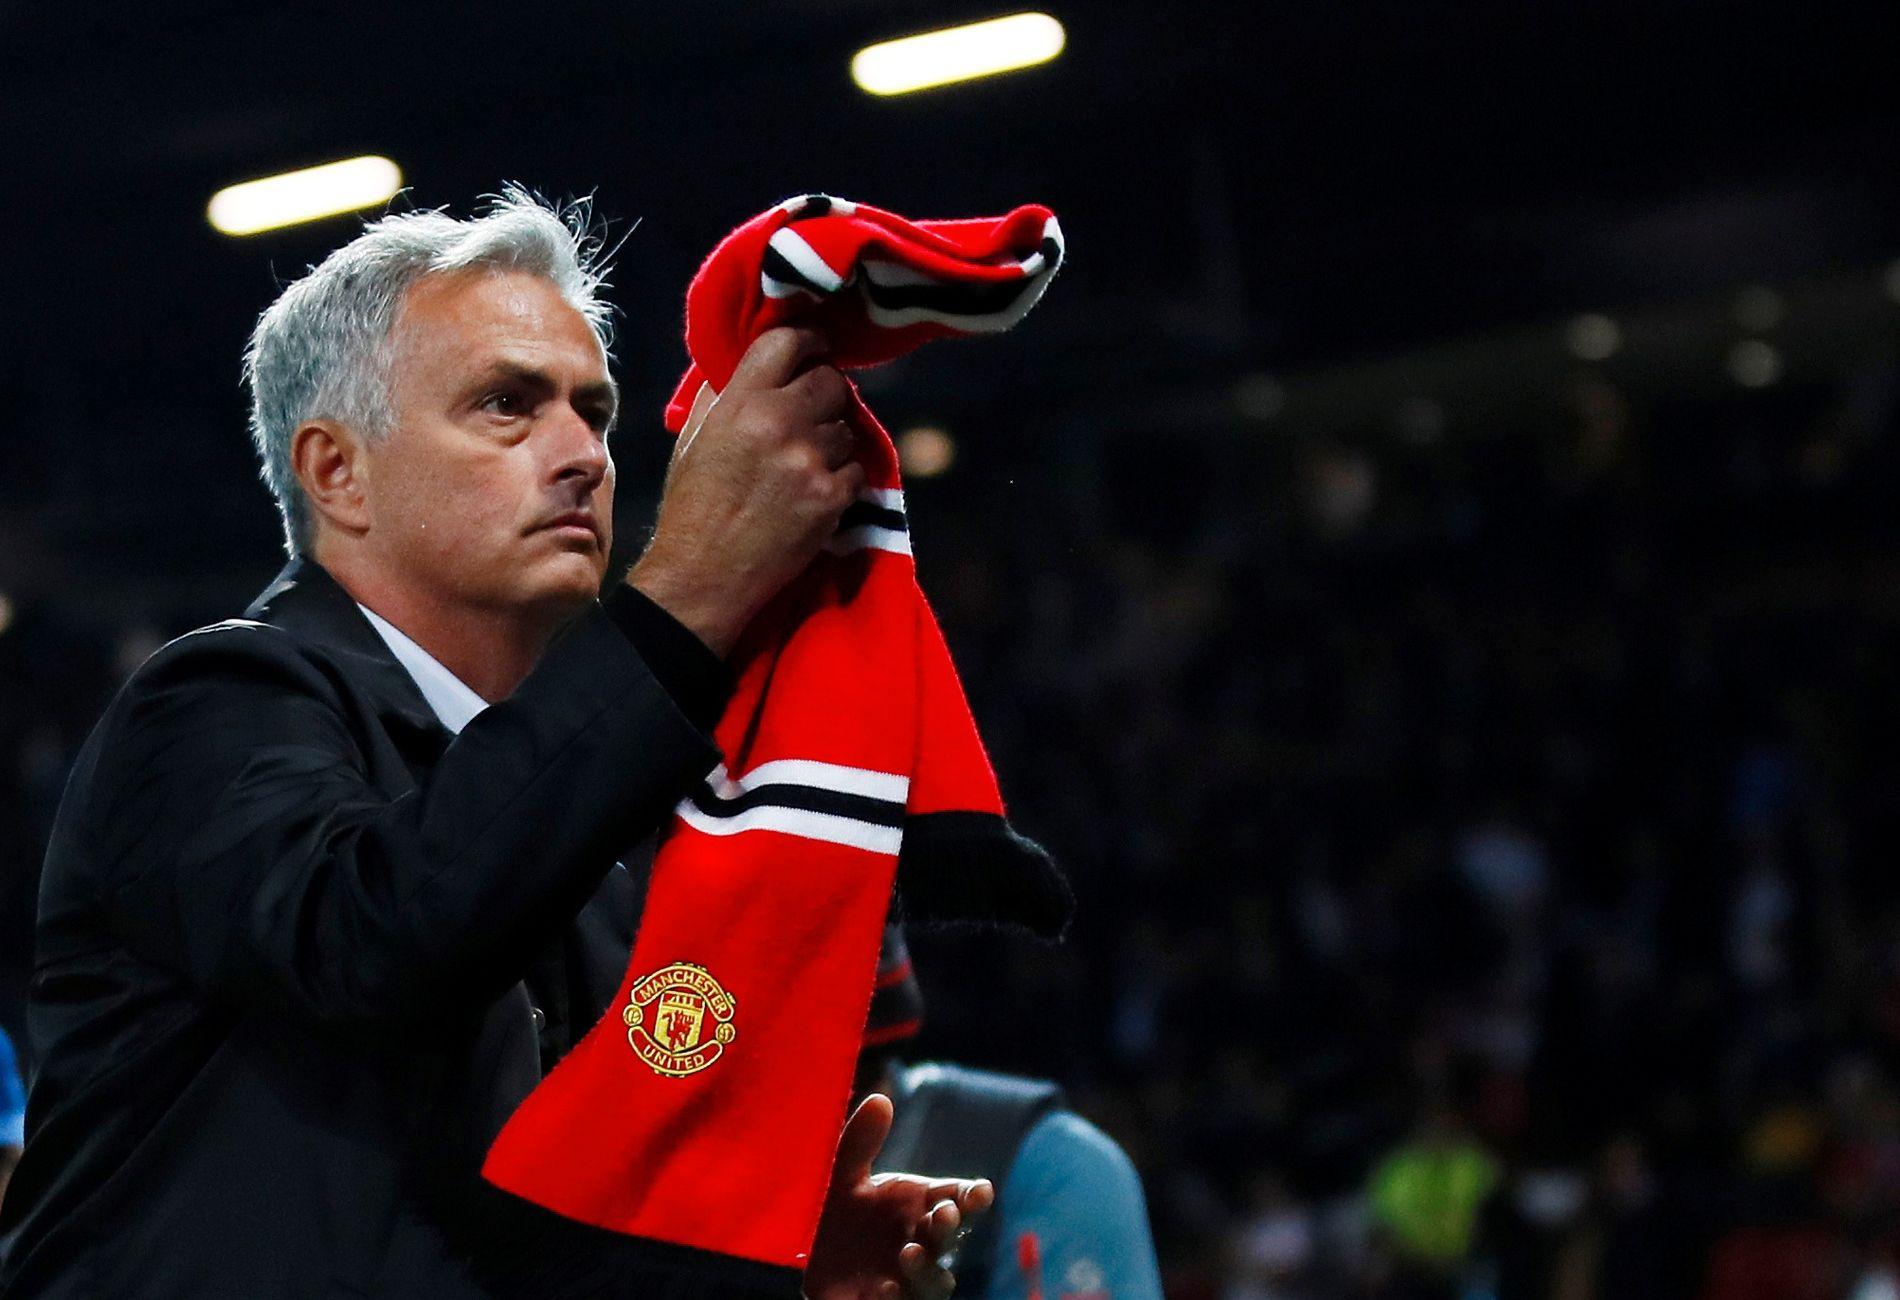 – FÅR FORTSETTE: José Mourinho får ifølge Manchester Evening News fortsette som manager i Manchester United.